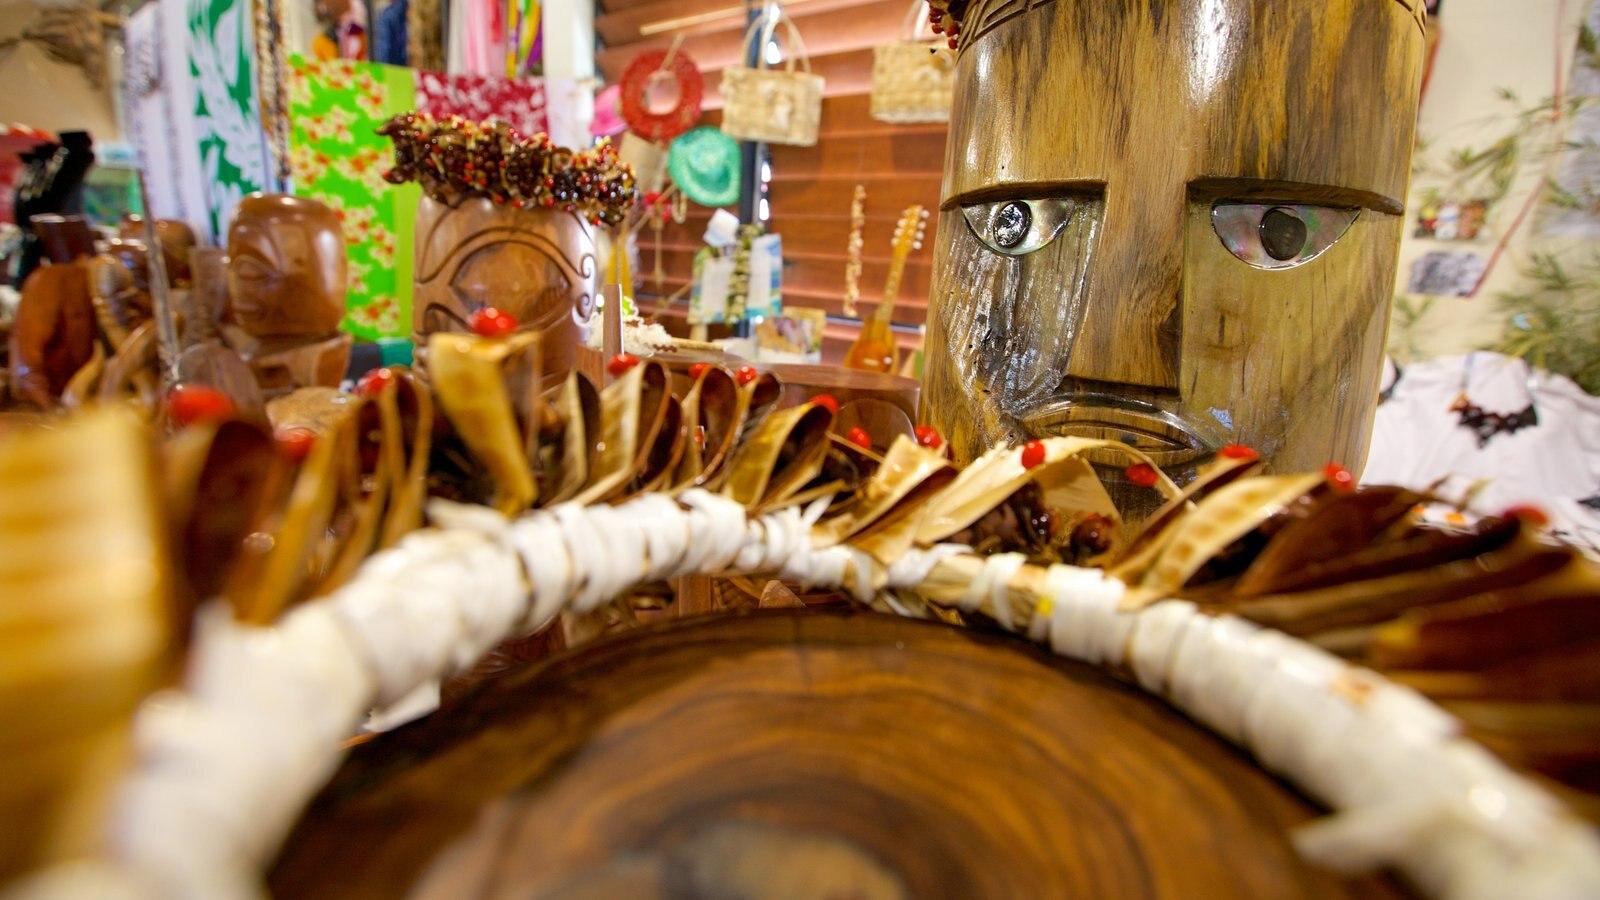 Uturoa caracterizando compras e cultura nativa